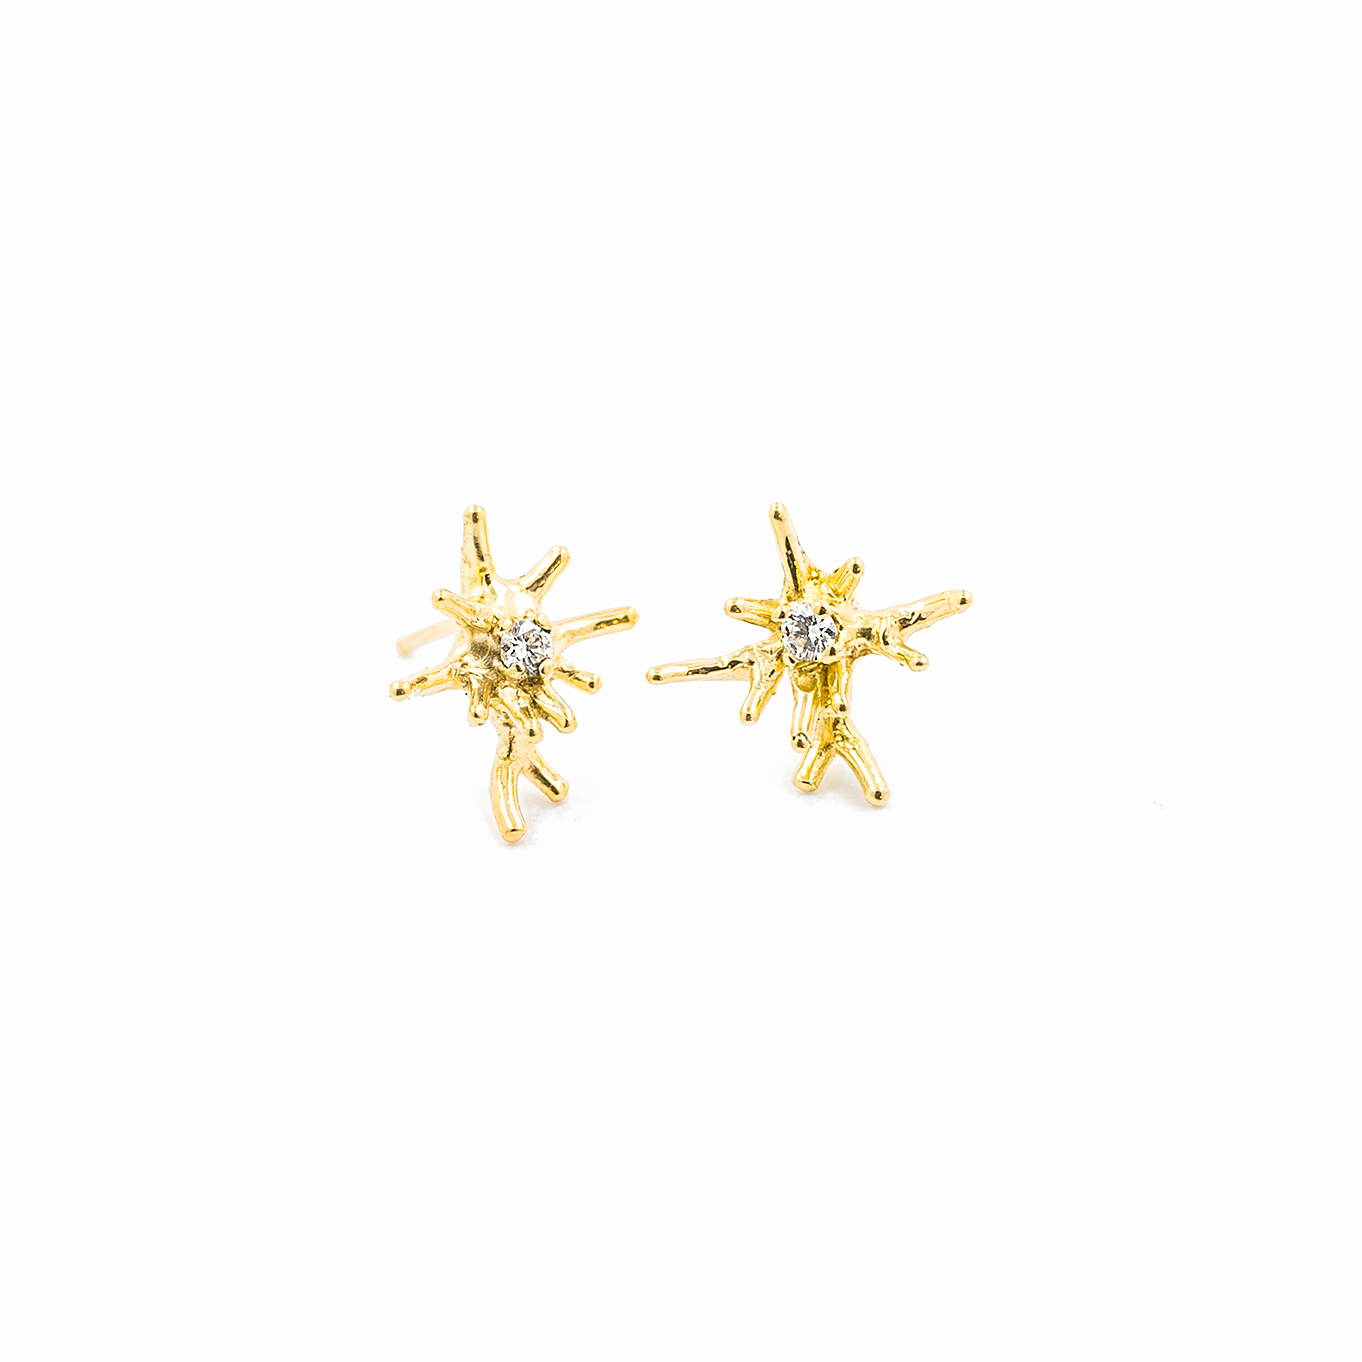 Small Unfolding Earrings | 18ct Yellow Gold, white diamonds.